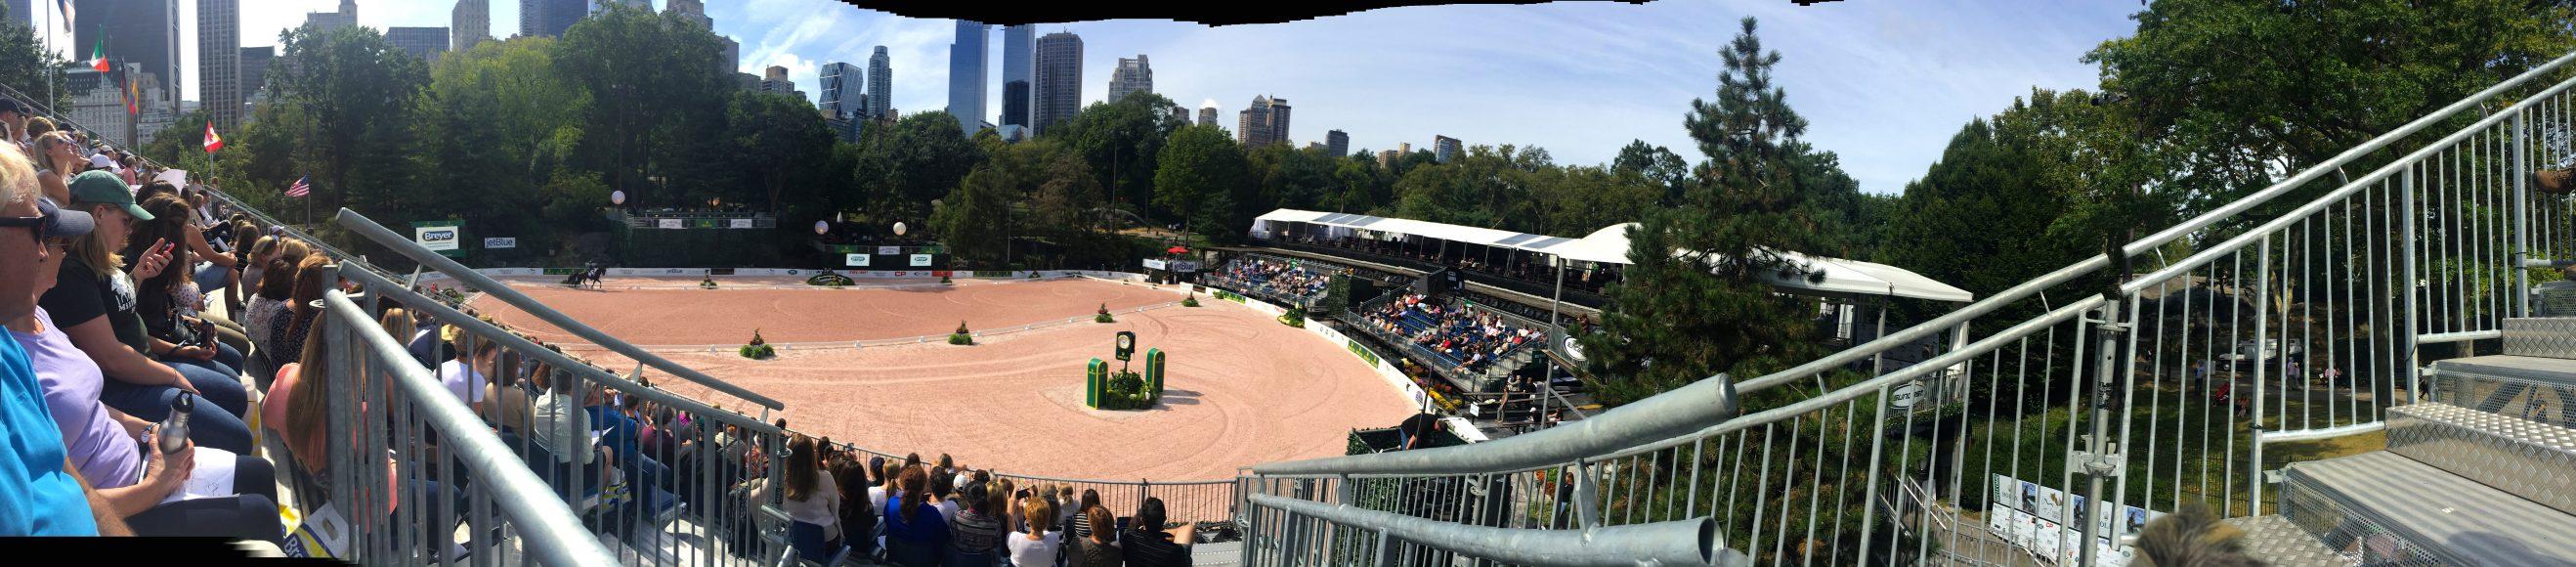 Central Park 2015!